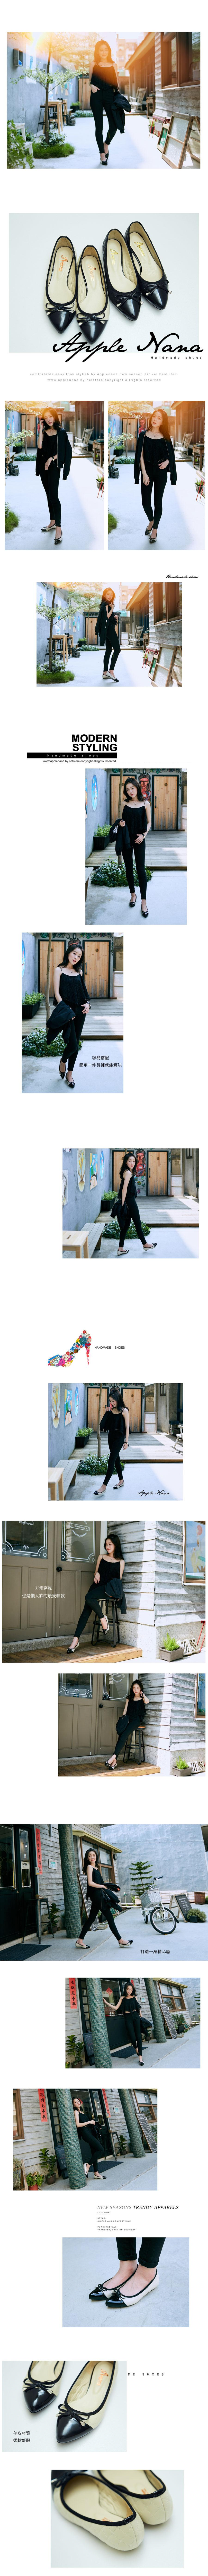 http://shop.r10s.com/5e7ca0c0-ec8c-11e4-ac44-005056b756e3/2016-05/T7311-4.jpg